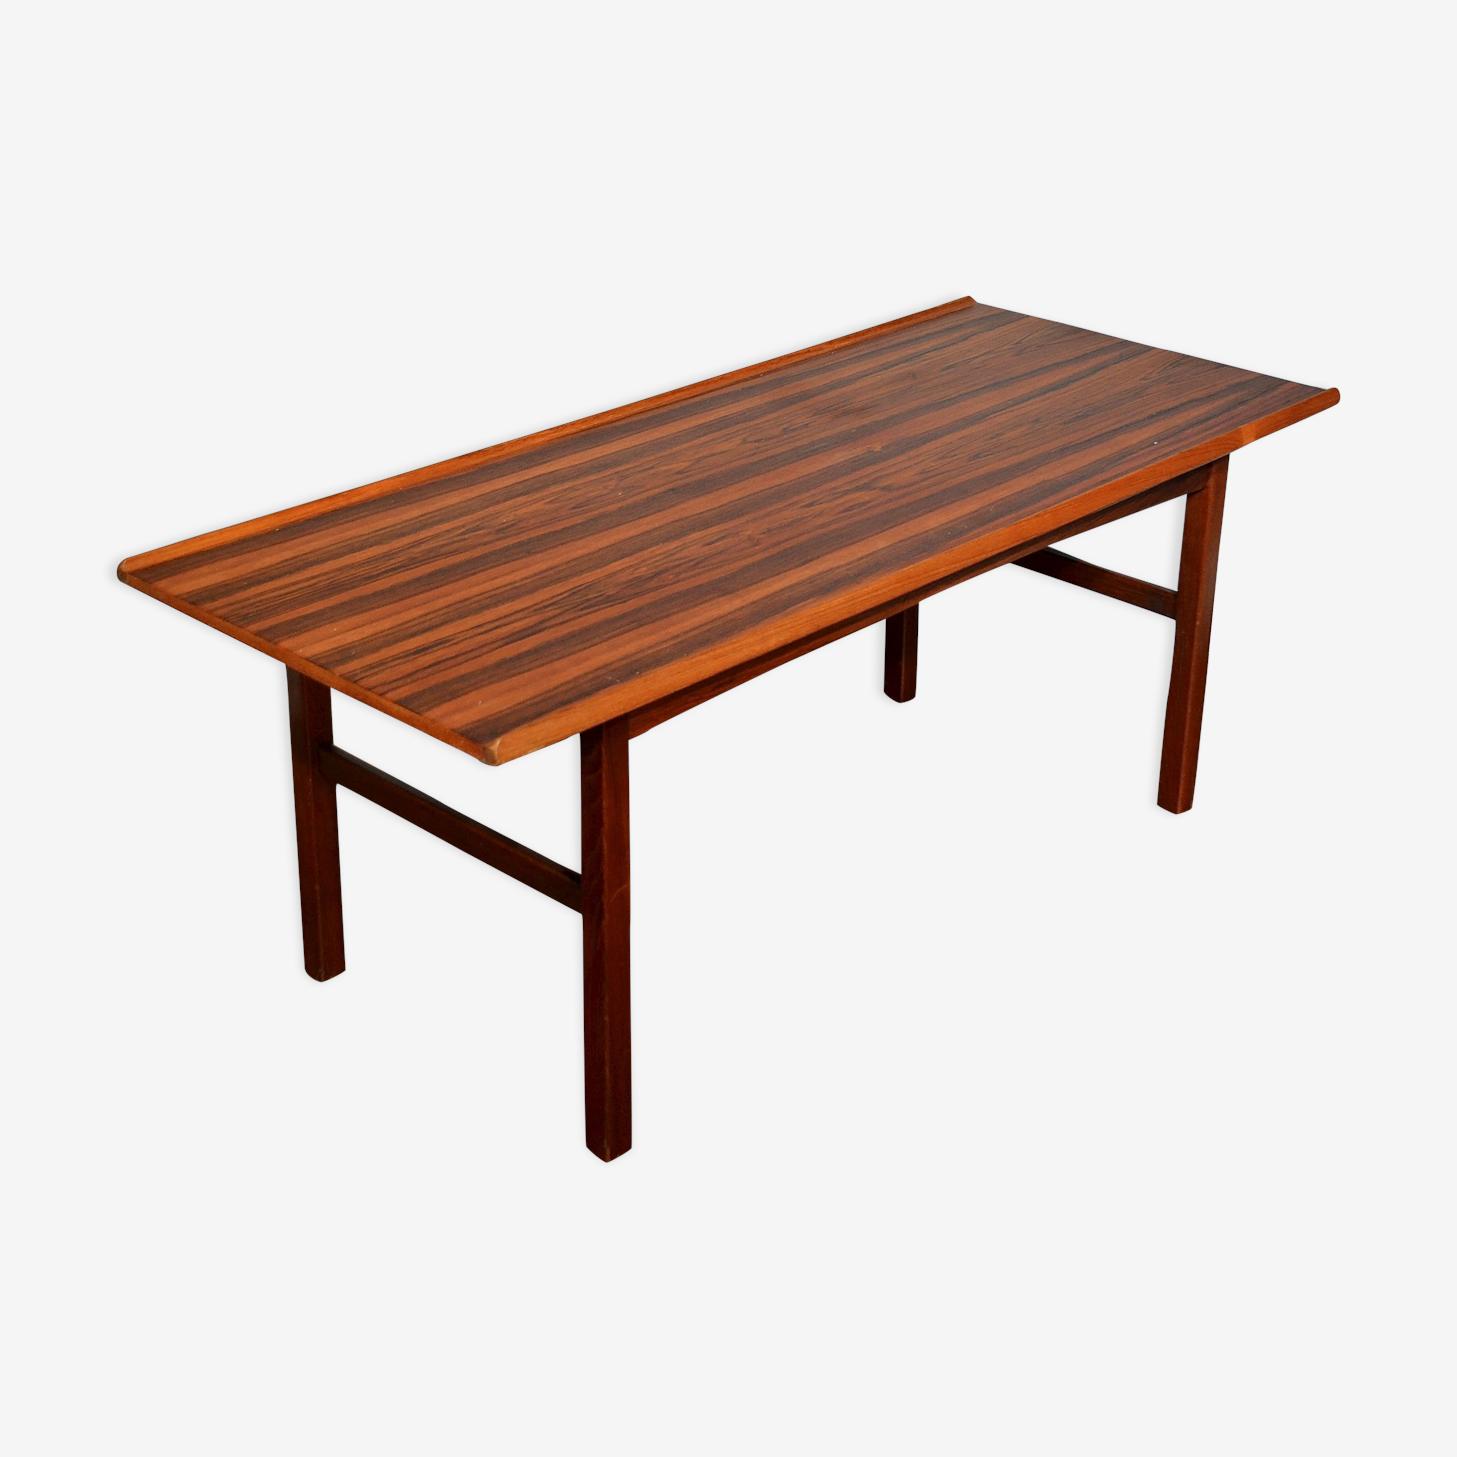 Danish coffee table in rosewood by Anton Kildeberg